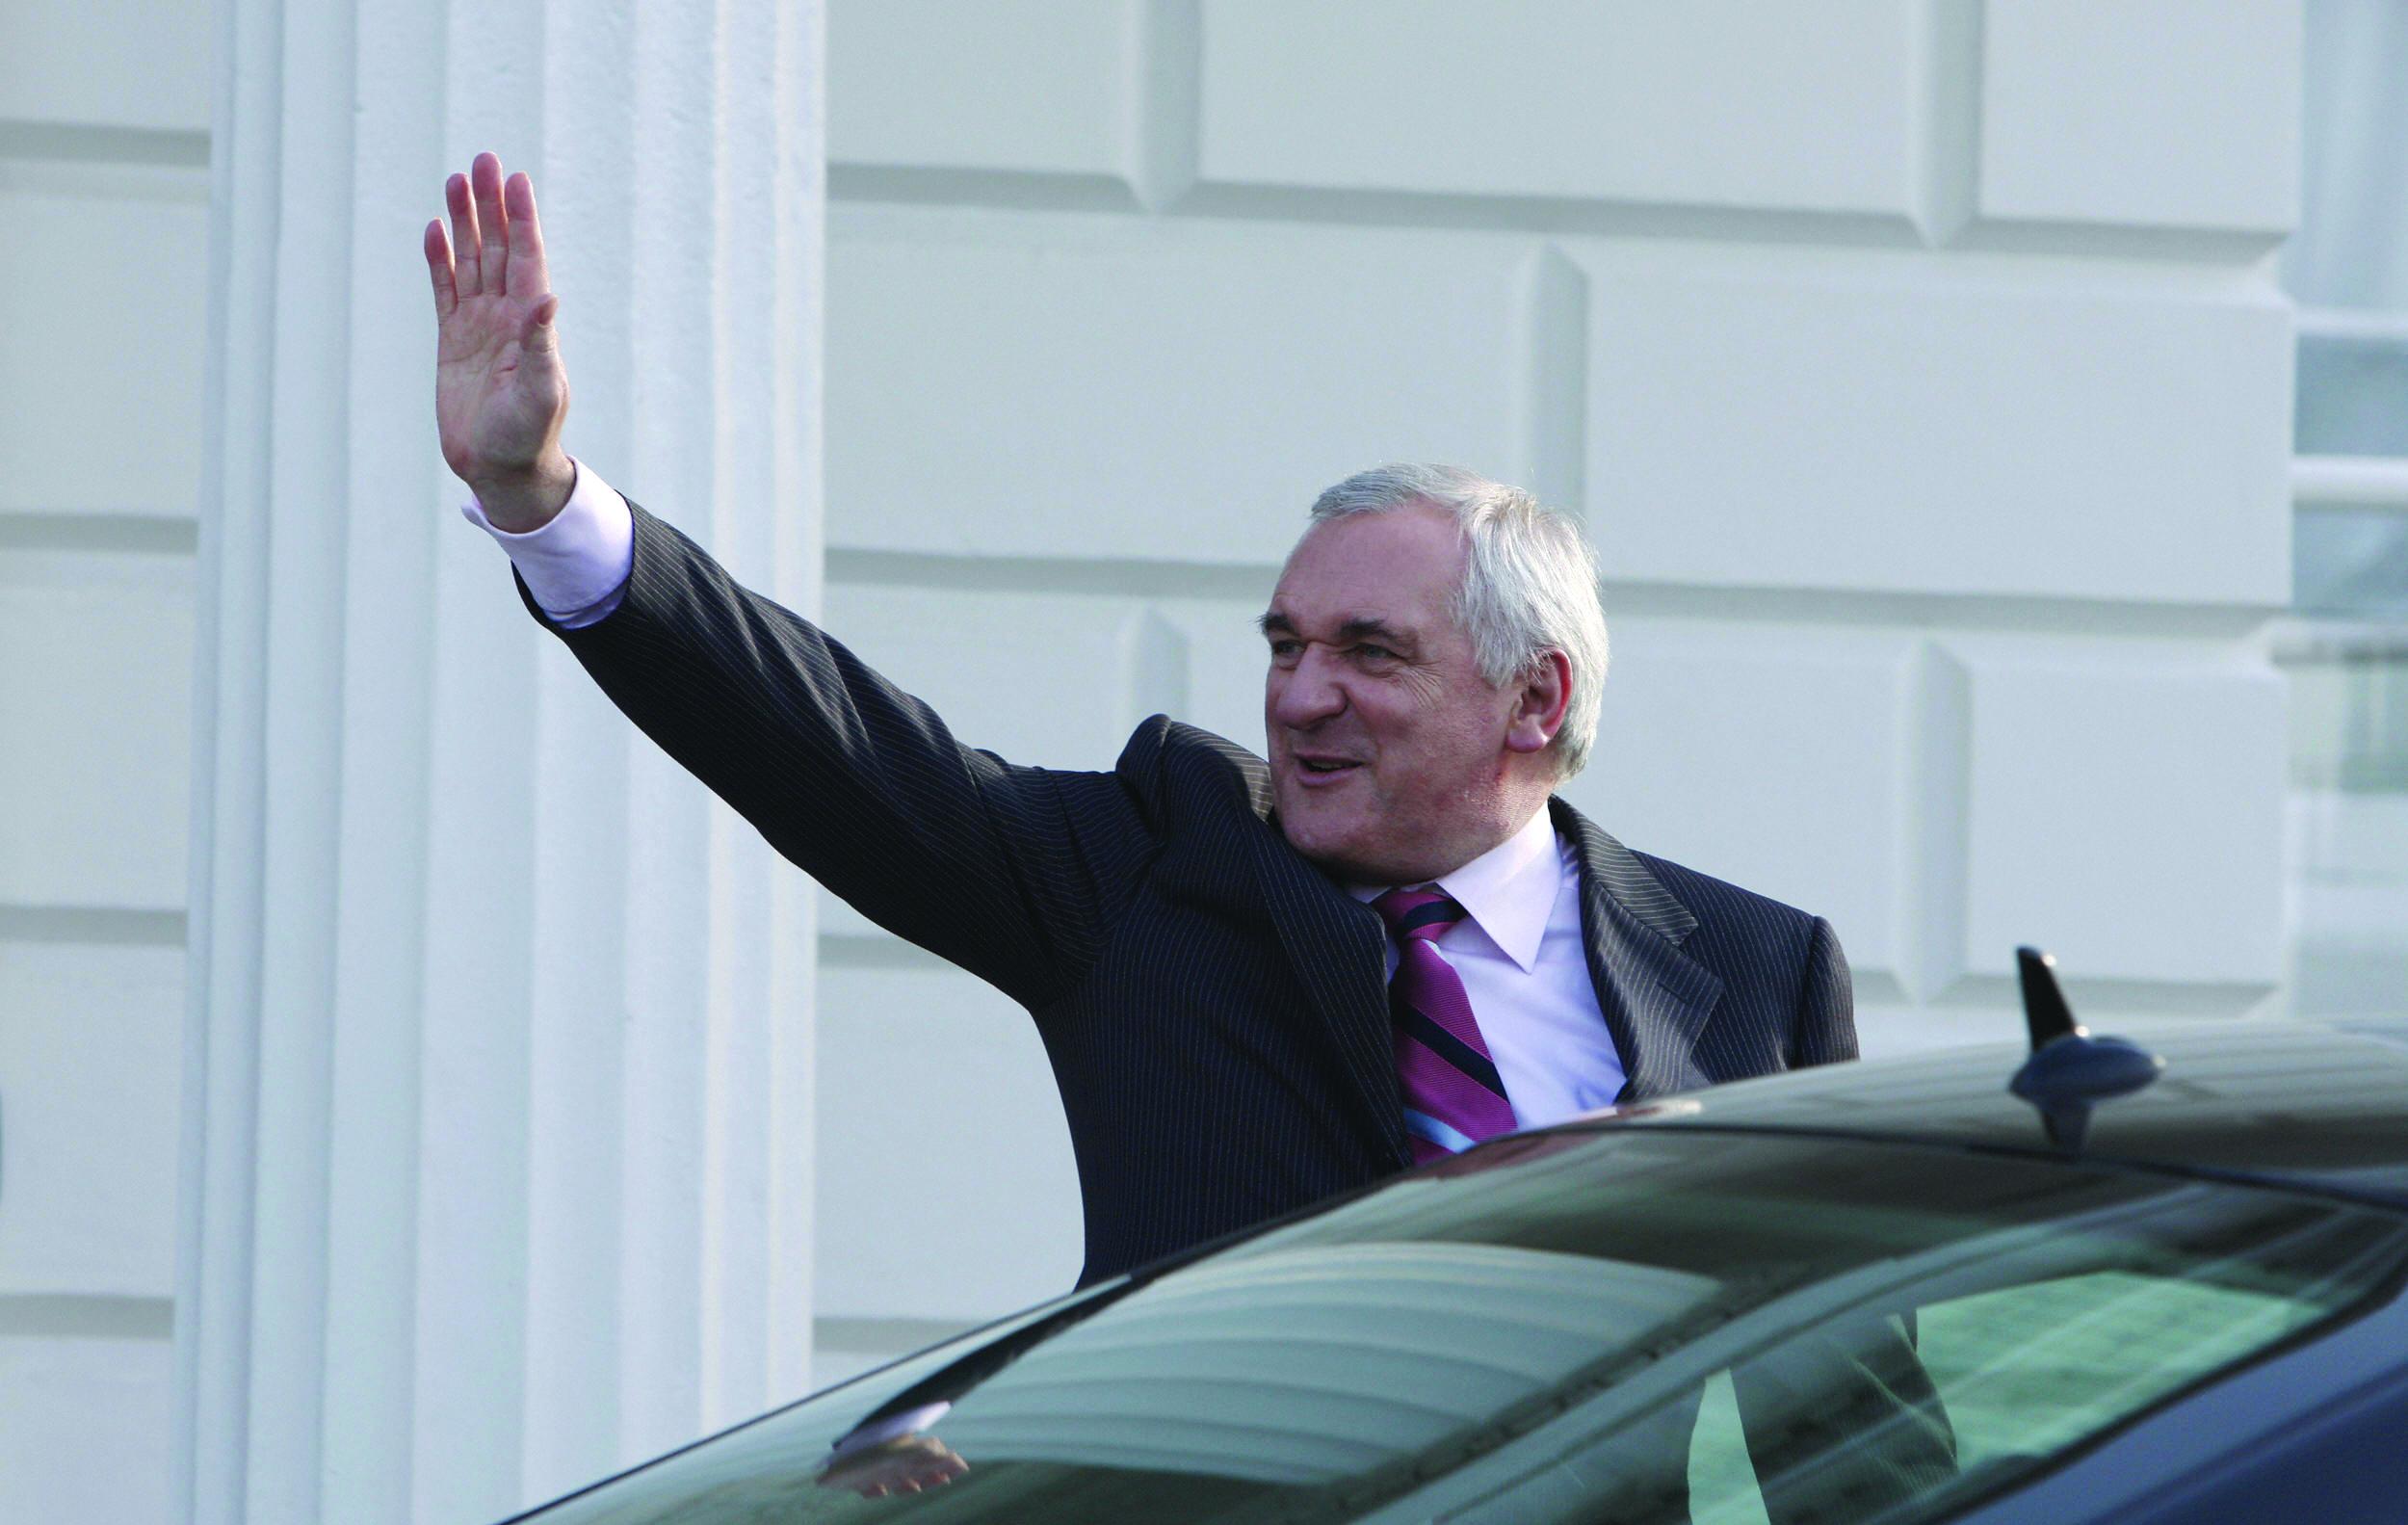 Irish Prime Minister (Taoiseach) Bertie